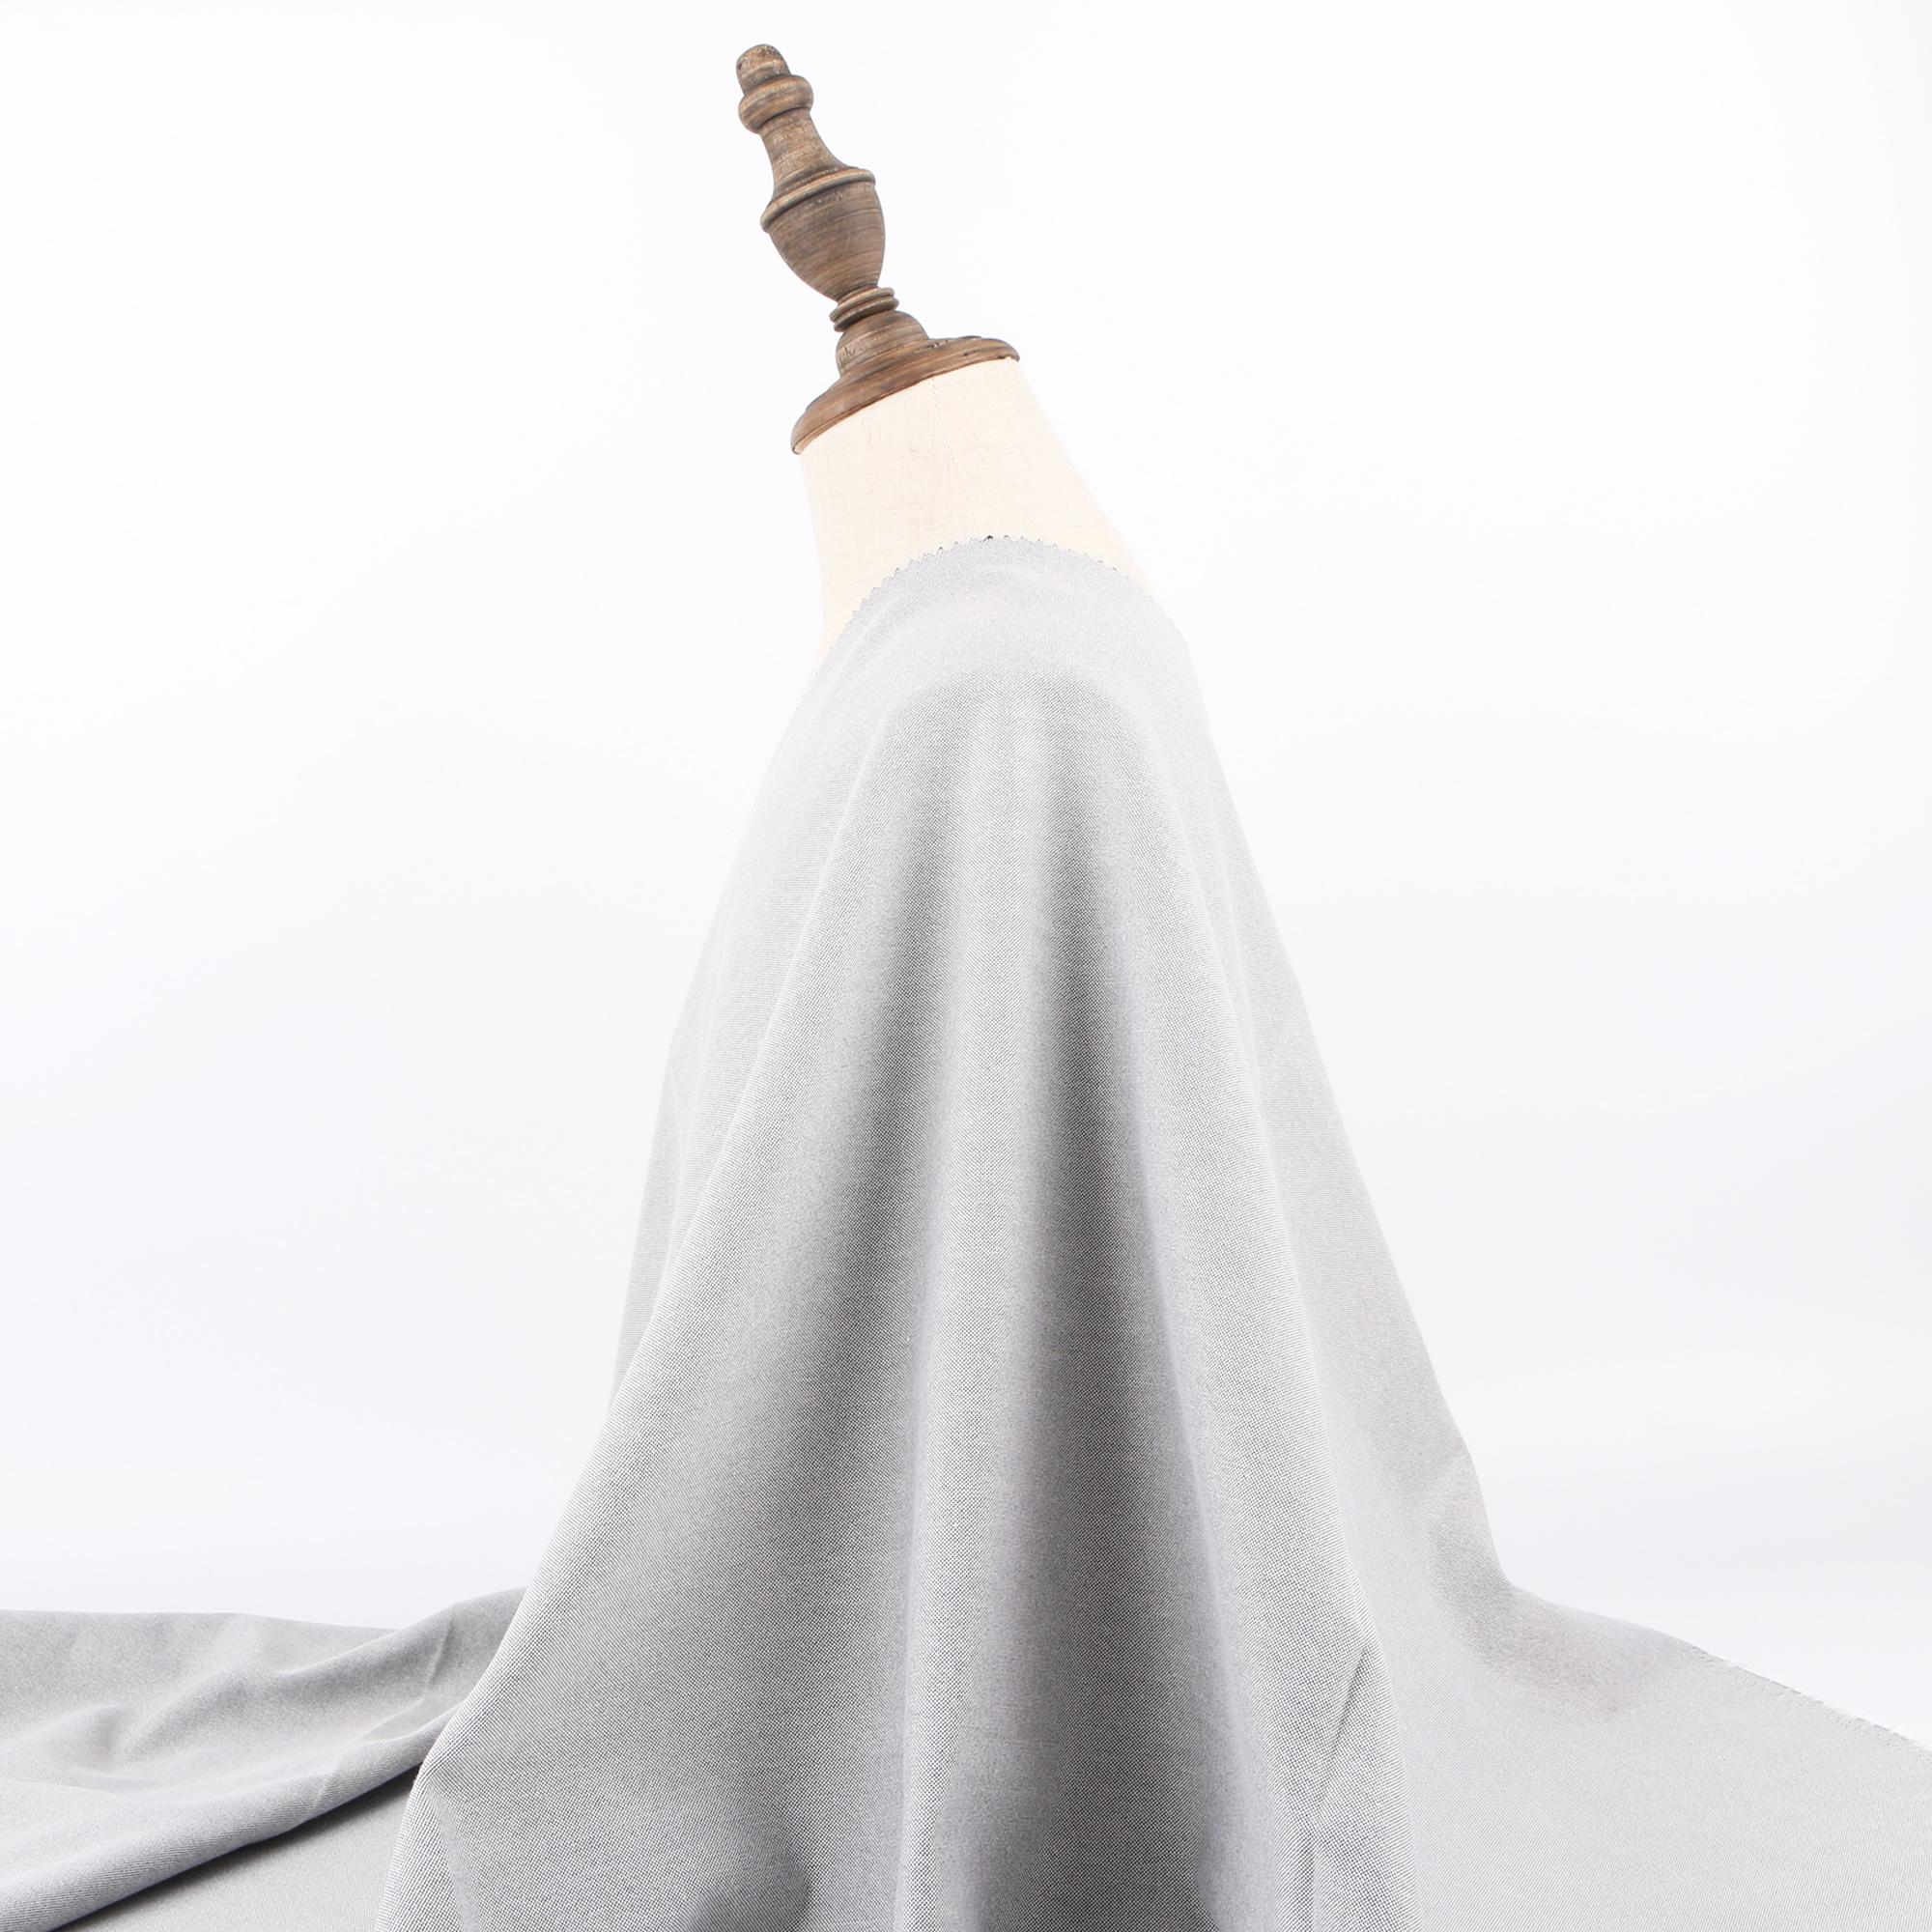 cvc 55 45 woven cotton polyester oxford shirt fabric for man garment